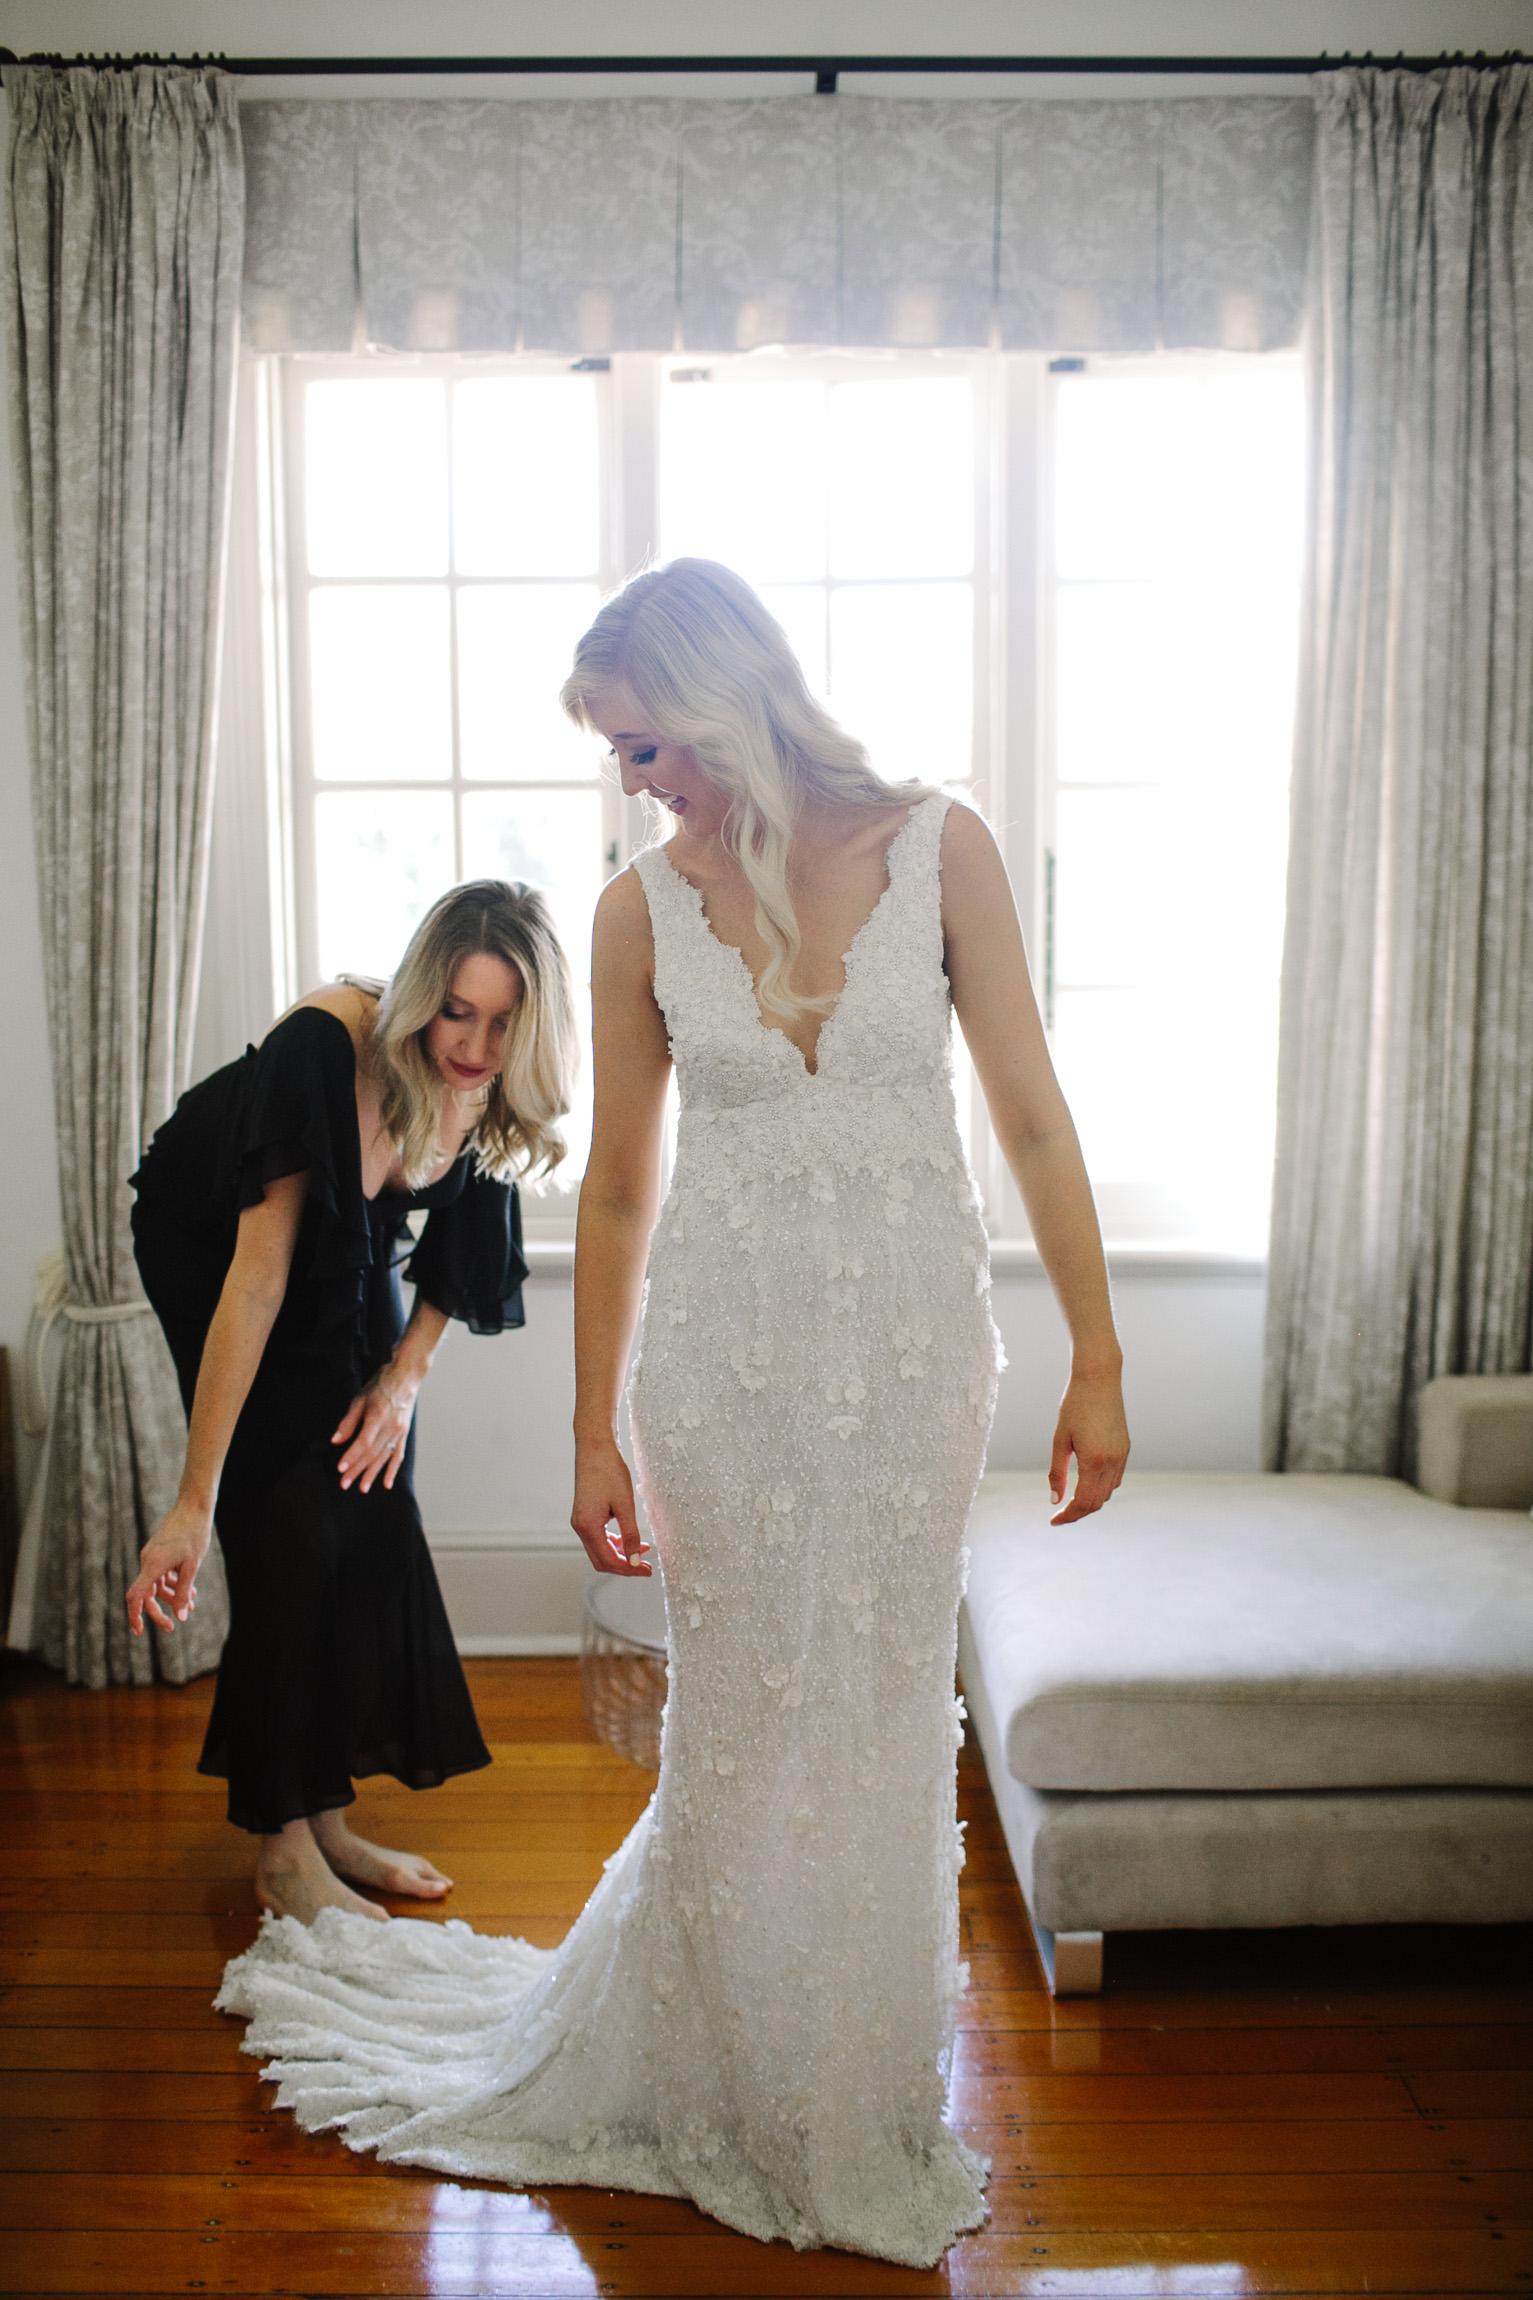 180223_justinaaron_wedding_charlotte_david_h-26.jpg